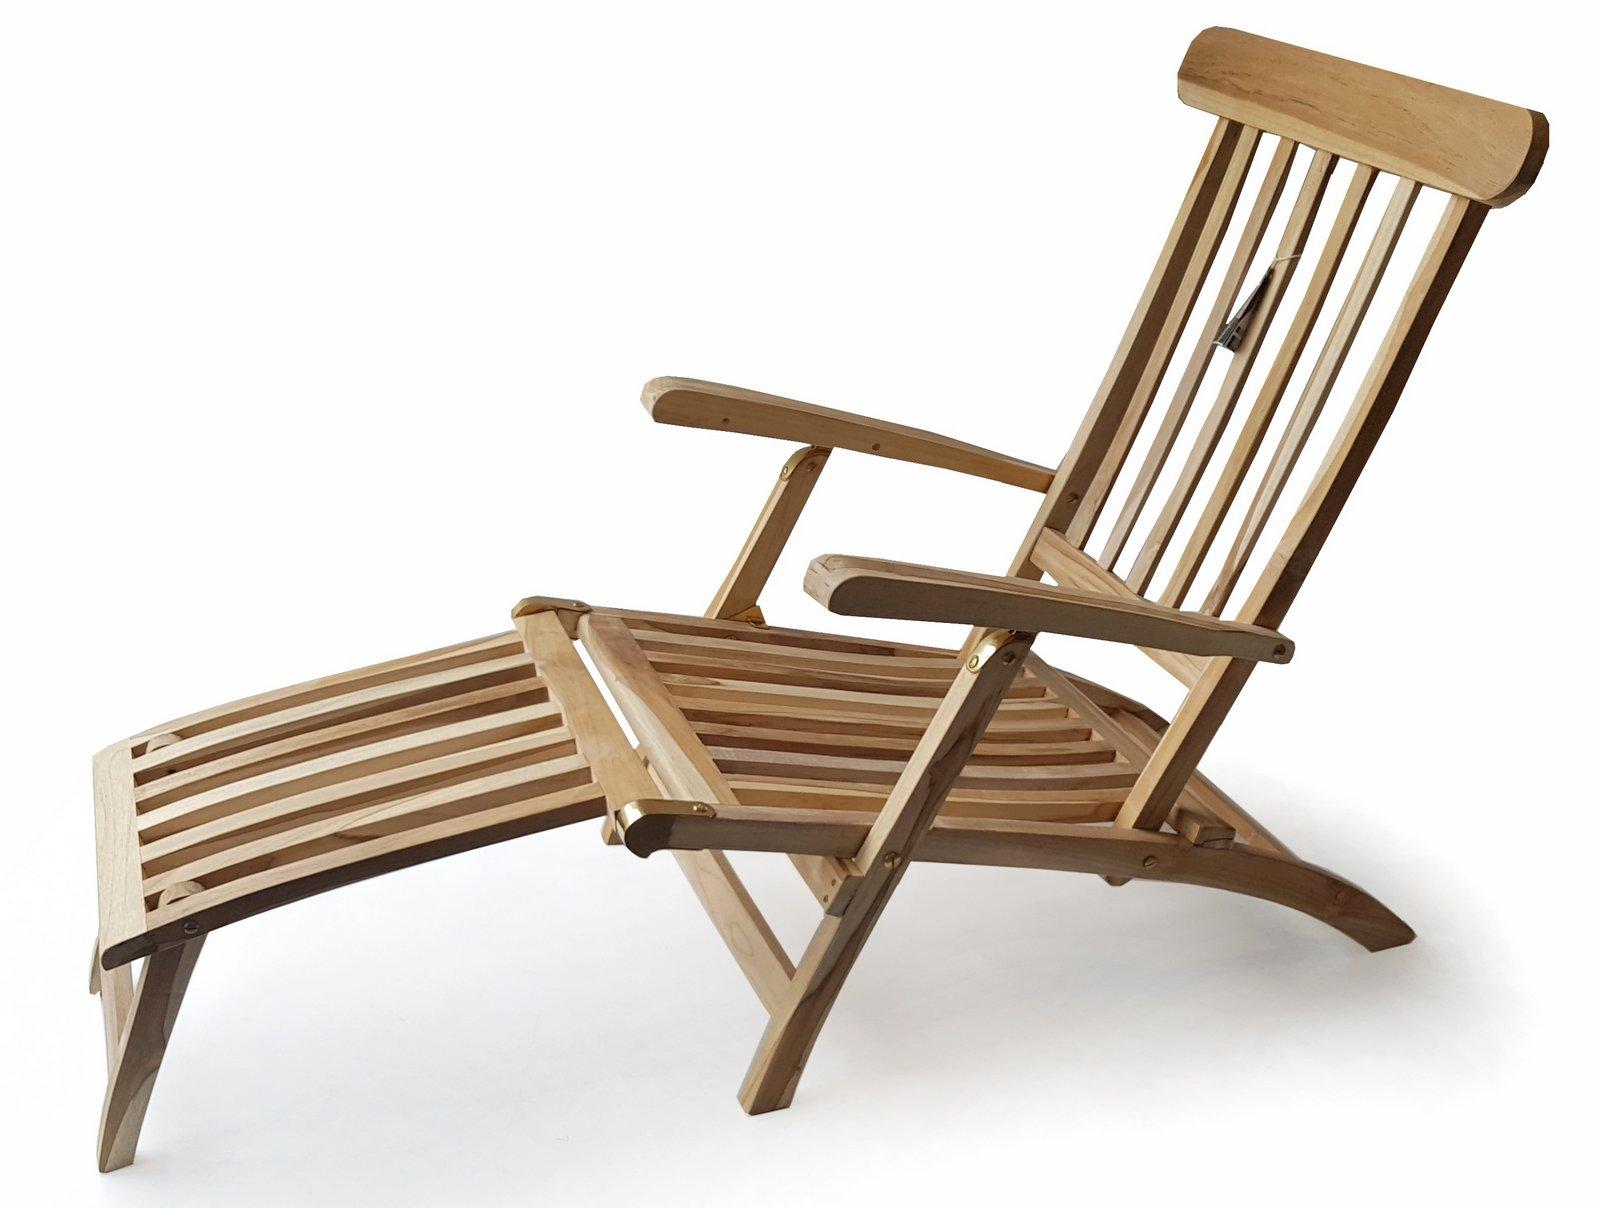 plo teak holz deckchair titanic liege stuhl sonnenliege 166x60x97cm relaxliegen garten. Black Bedroom Furniture Sets. Home Design Ideas